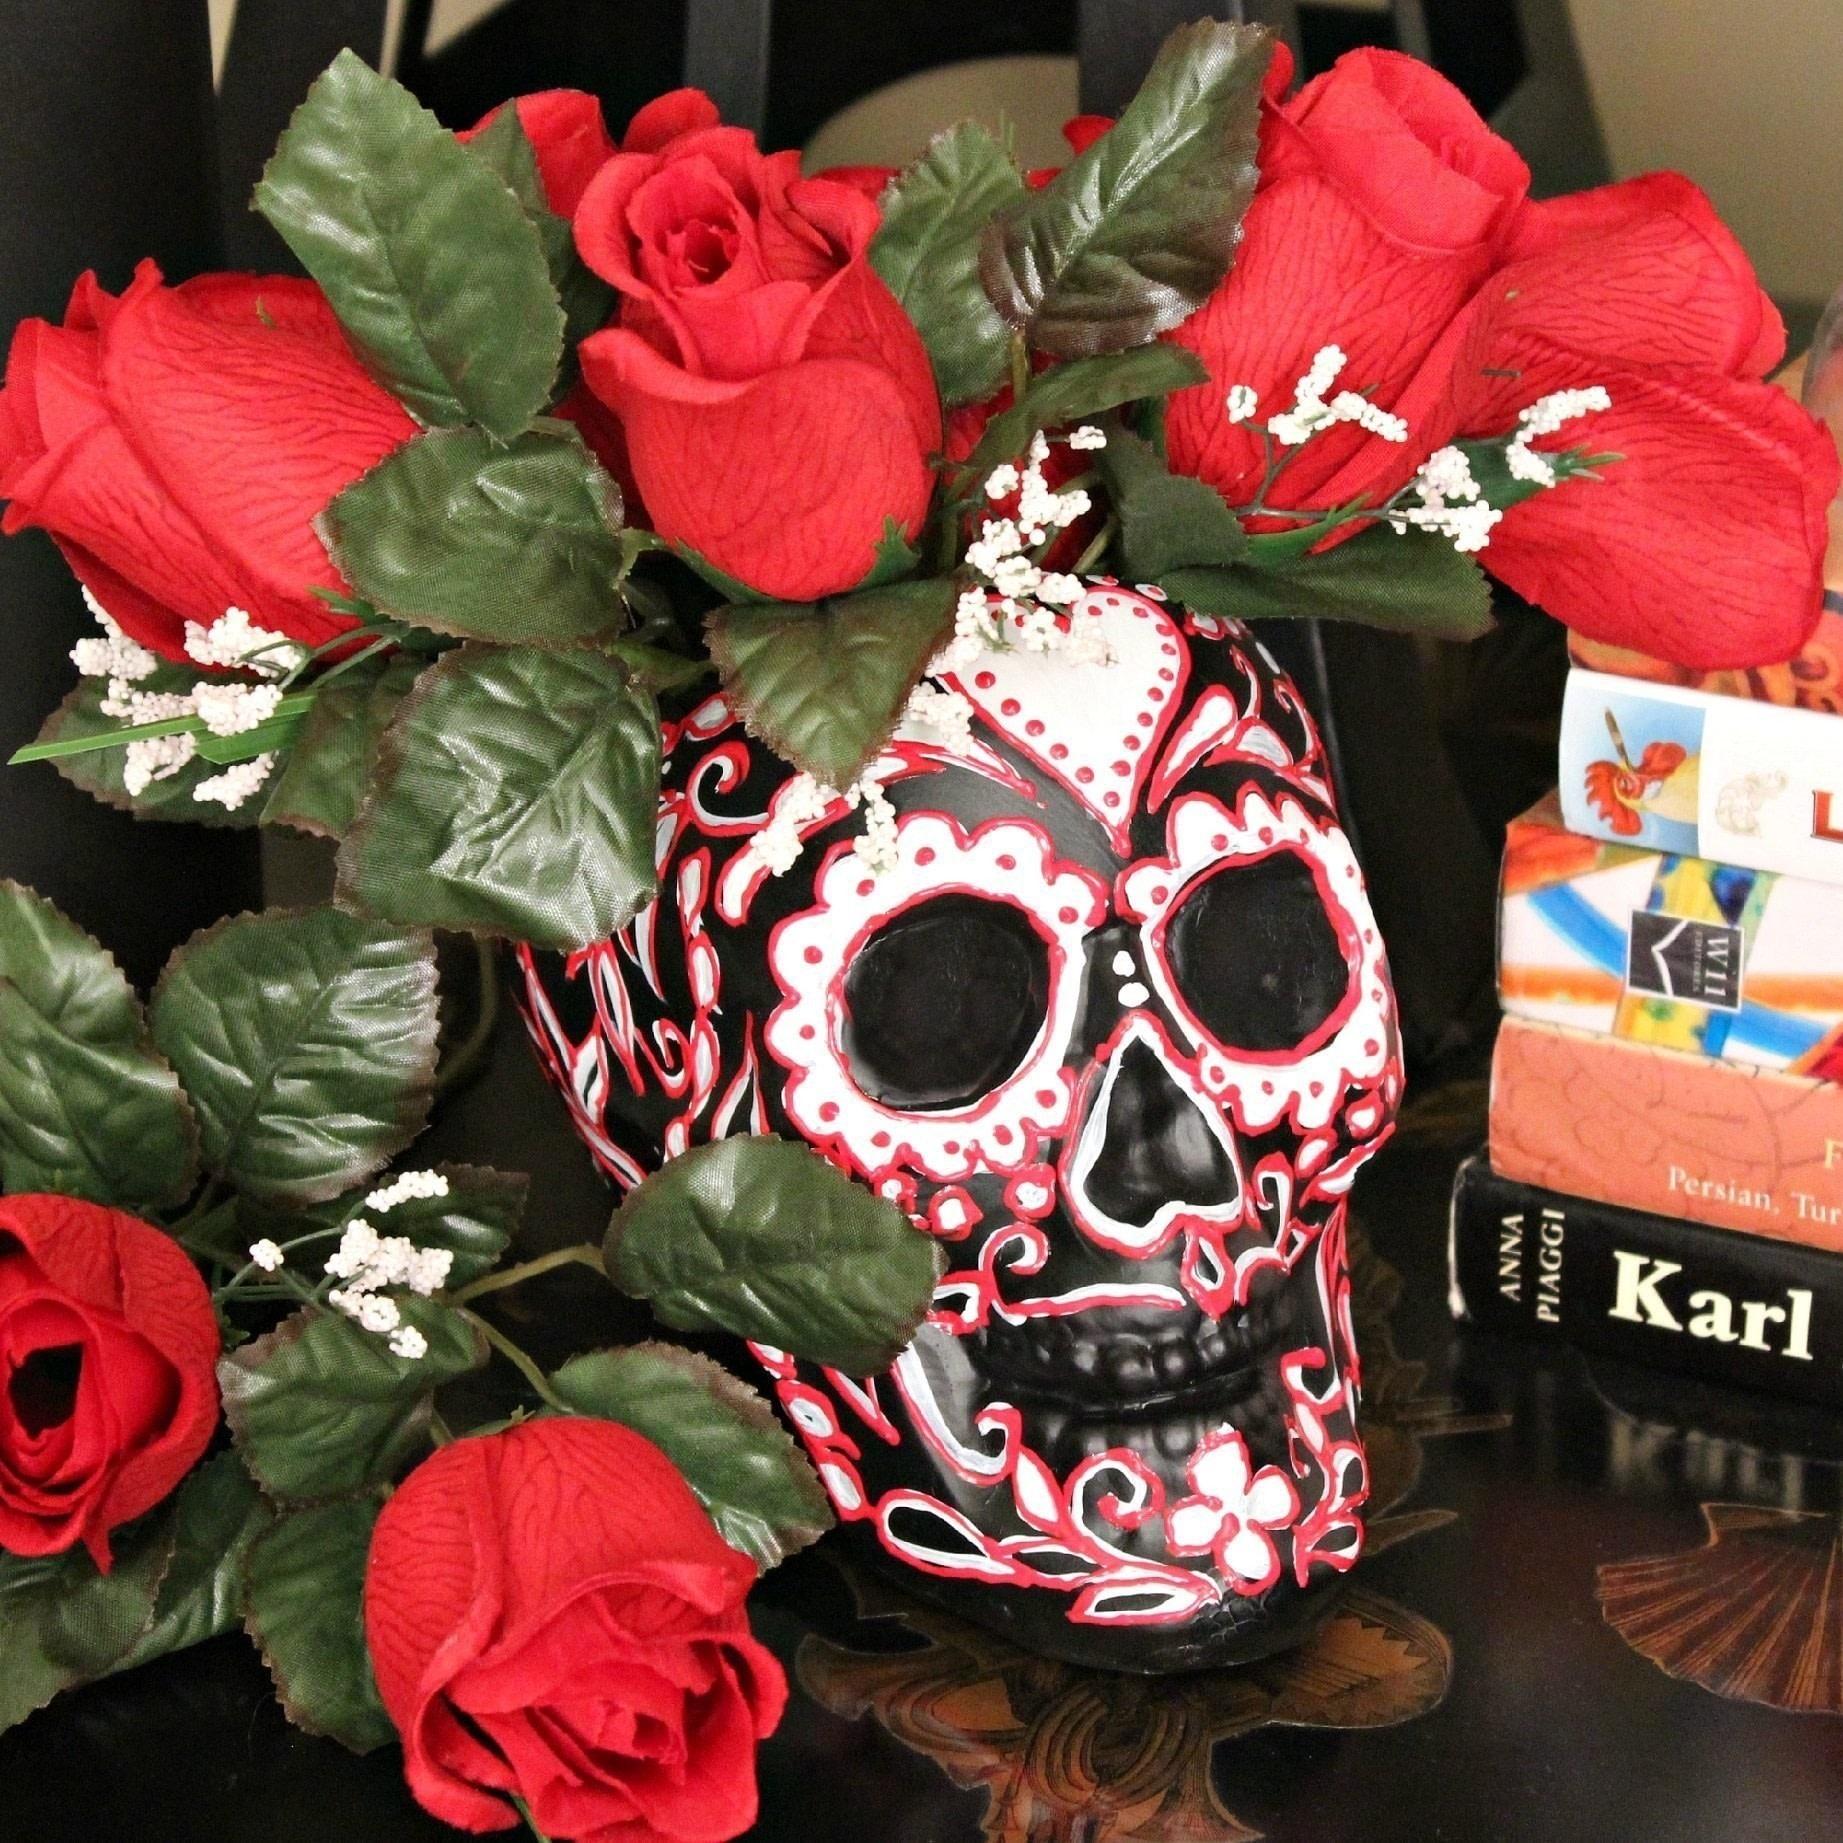 Sugar Skull Vase 183 How To Make A Vase Pot Or Planter 183 Decorating On Cut Out Keep